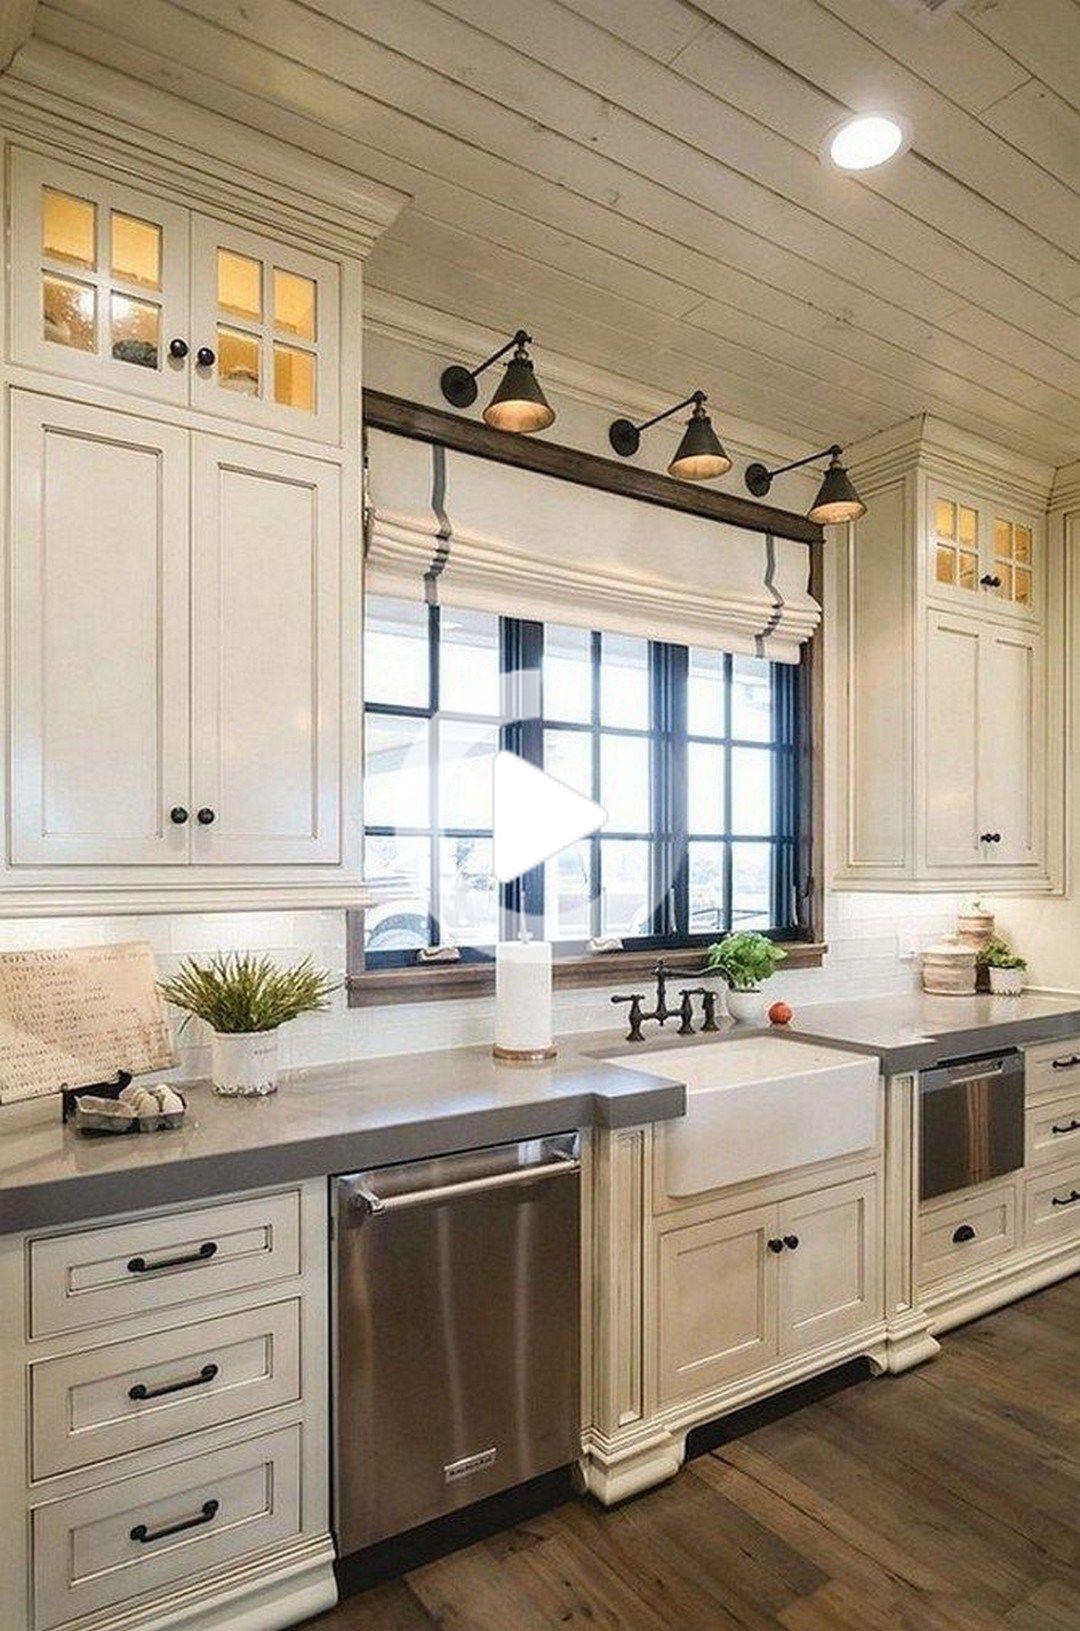 98 Bricolage Cuisine Renove En 1900 Vintage Country Ferme Ferme Chambre In 2020 Diy Kitchen Remodel Kitchen Cabinets Decor Farmhouse Kitchen Design